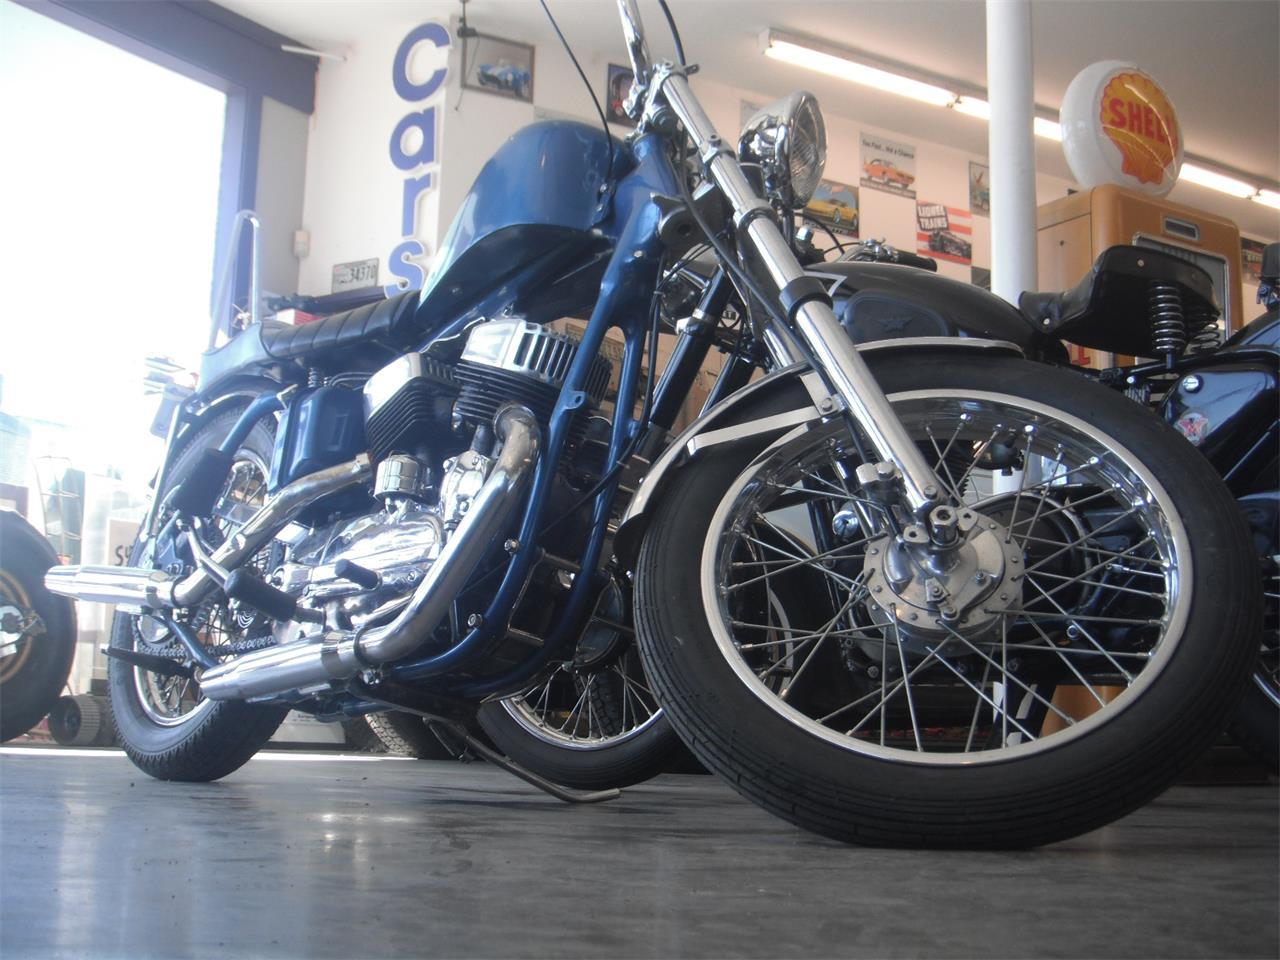 For Sale 1955 Harley Davidson Motorcycle In Carnation Washington